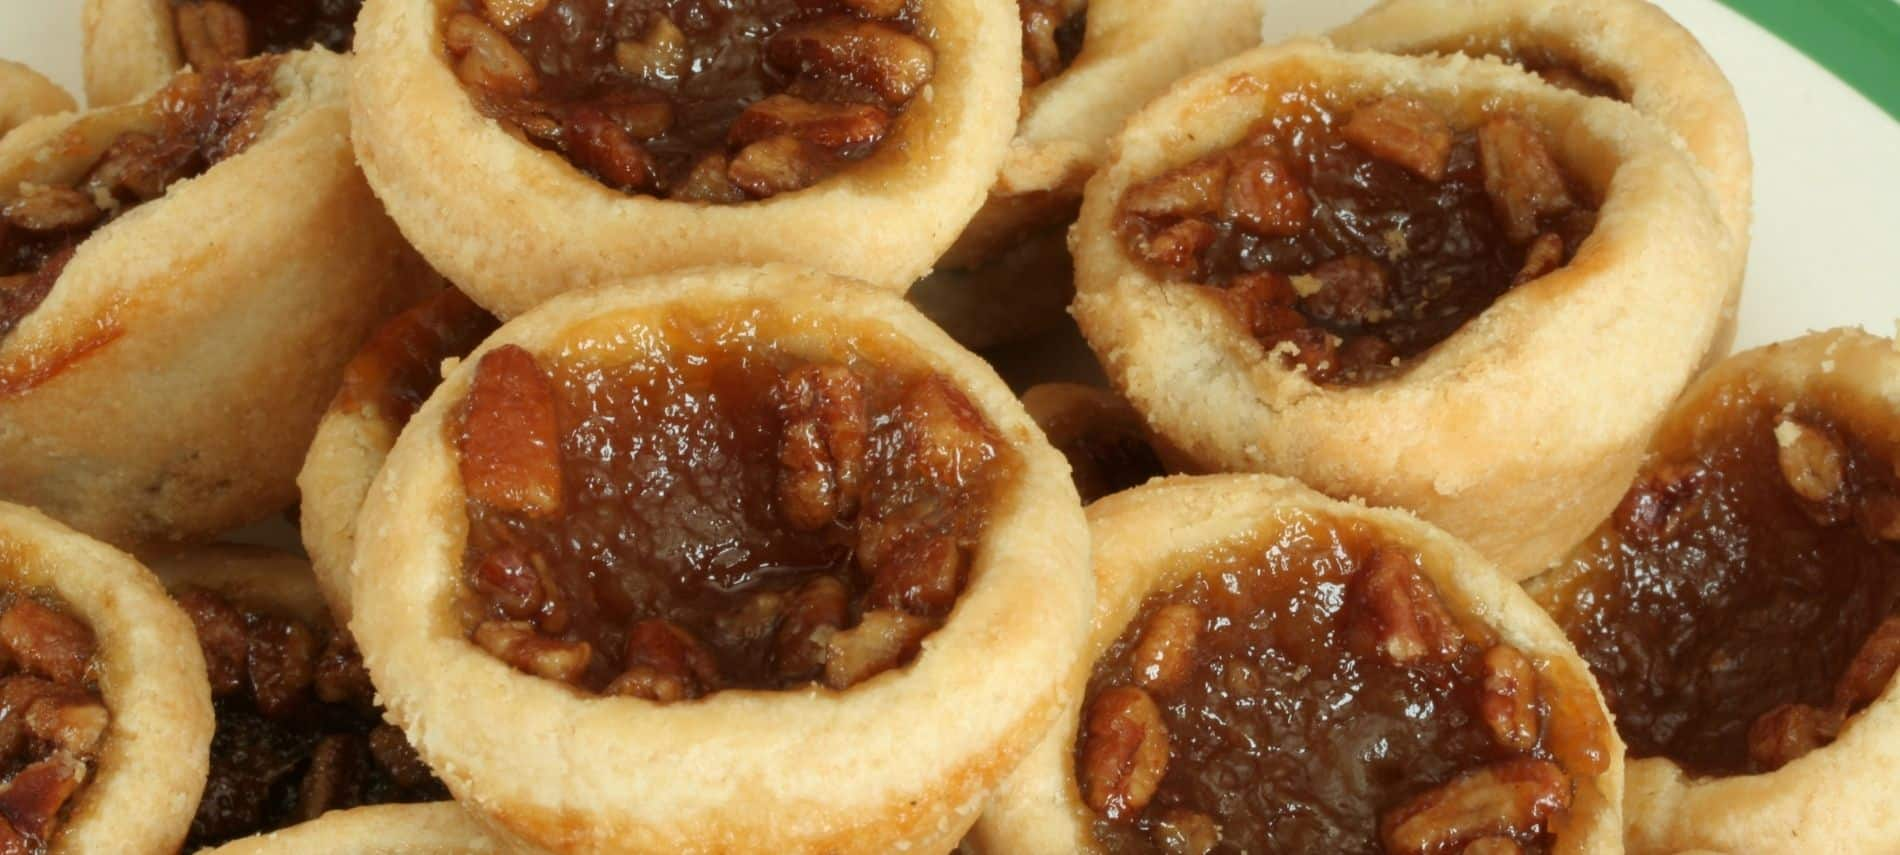 Plate full of freshly bakes pecan tarts